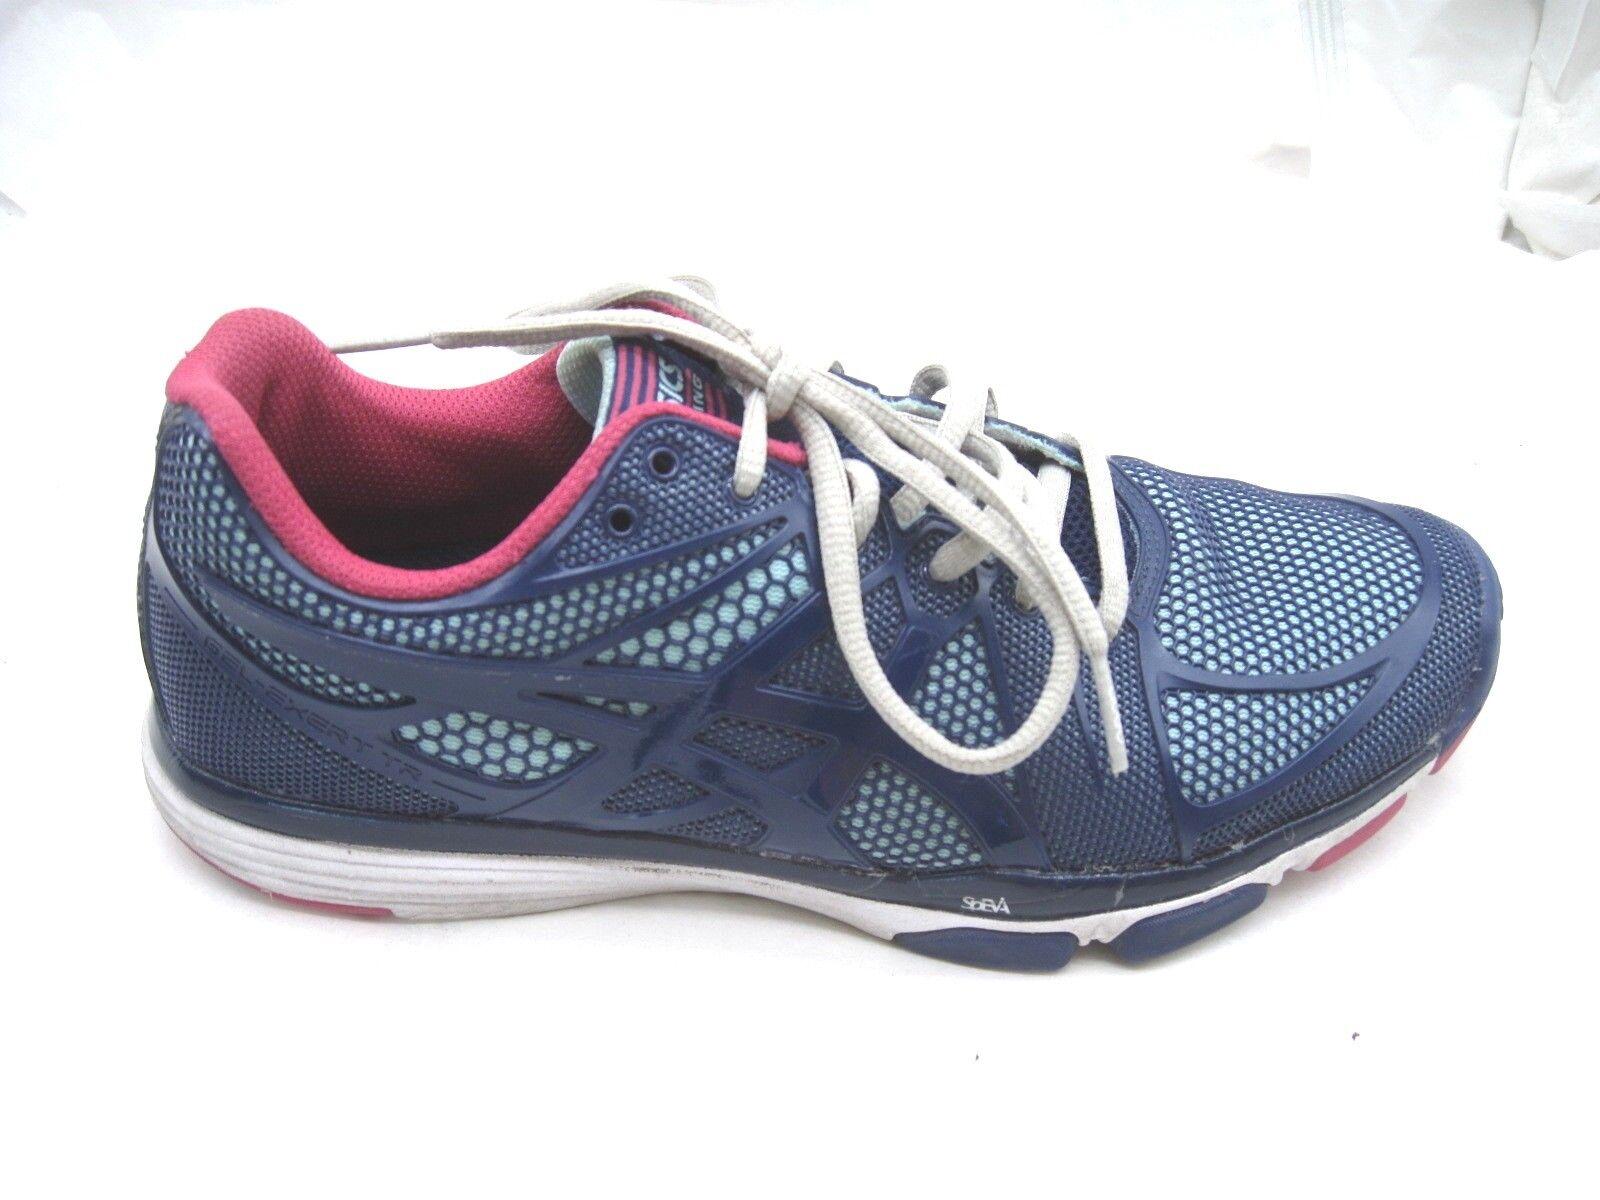 Asics S460N 8M Gel-Exert TR navy bluee training  womens ladies running shoes